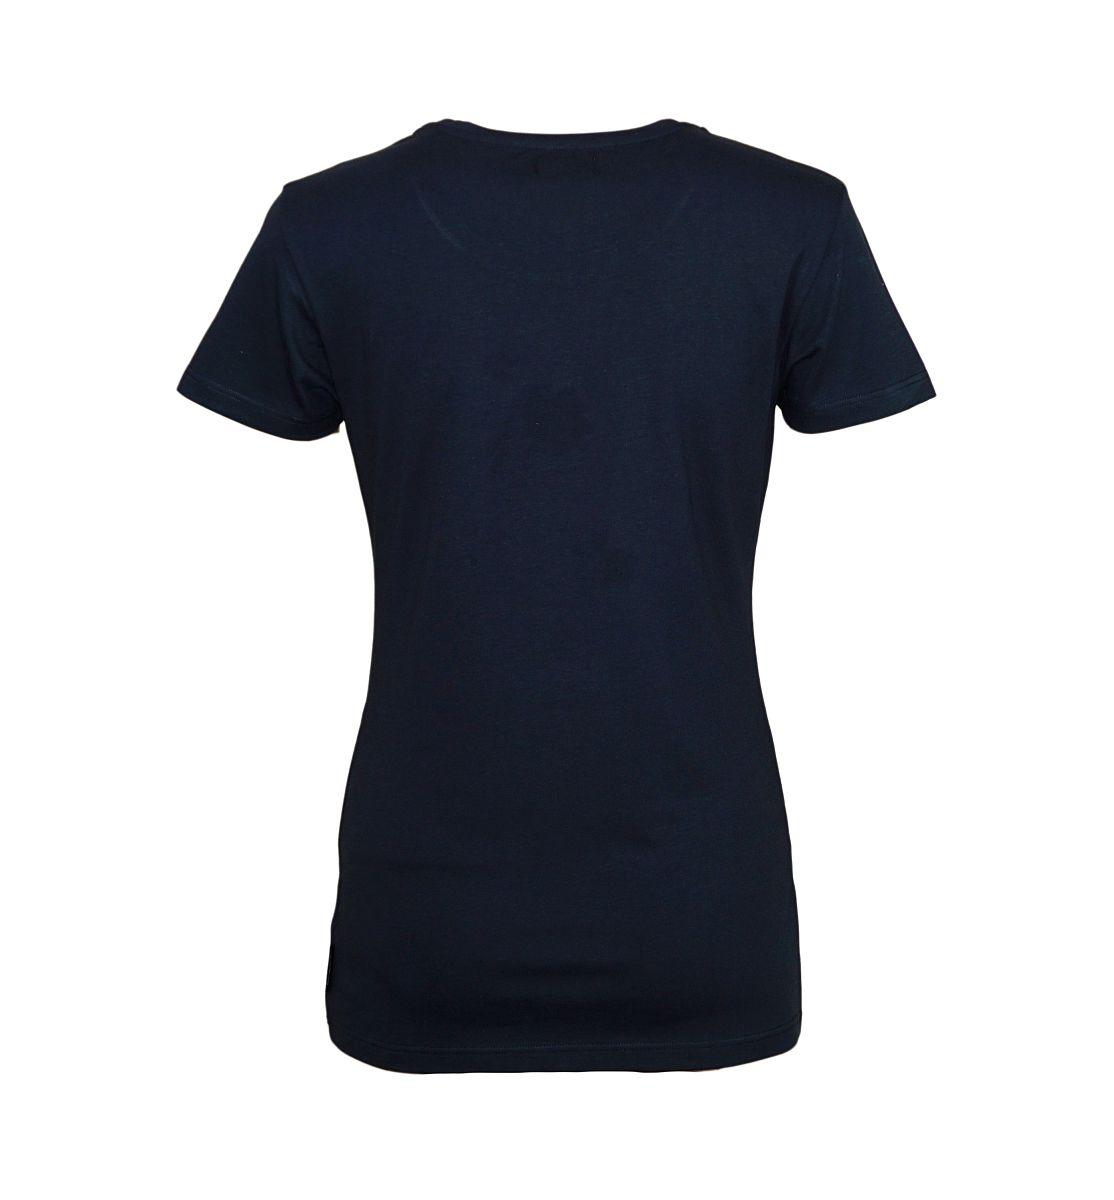 Emporio Armani Damen Shirt T-Shirt V-Ausschnitt 163321 7A263 00135 MARINE HW17-EADS1